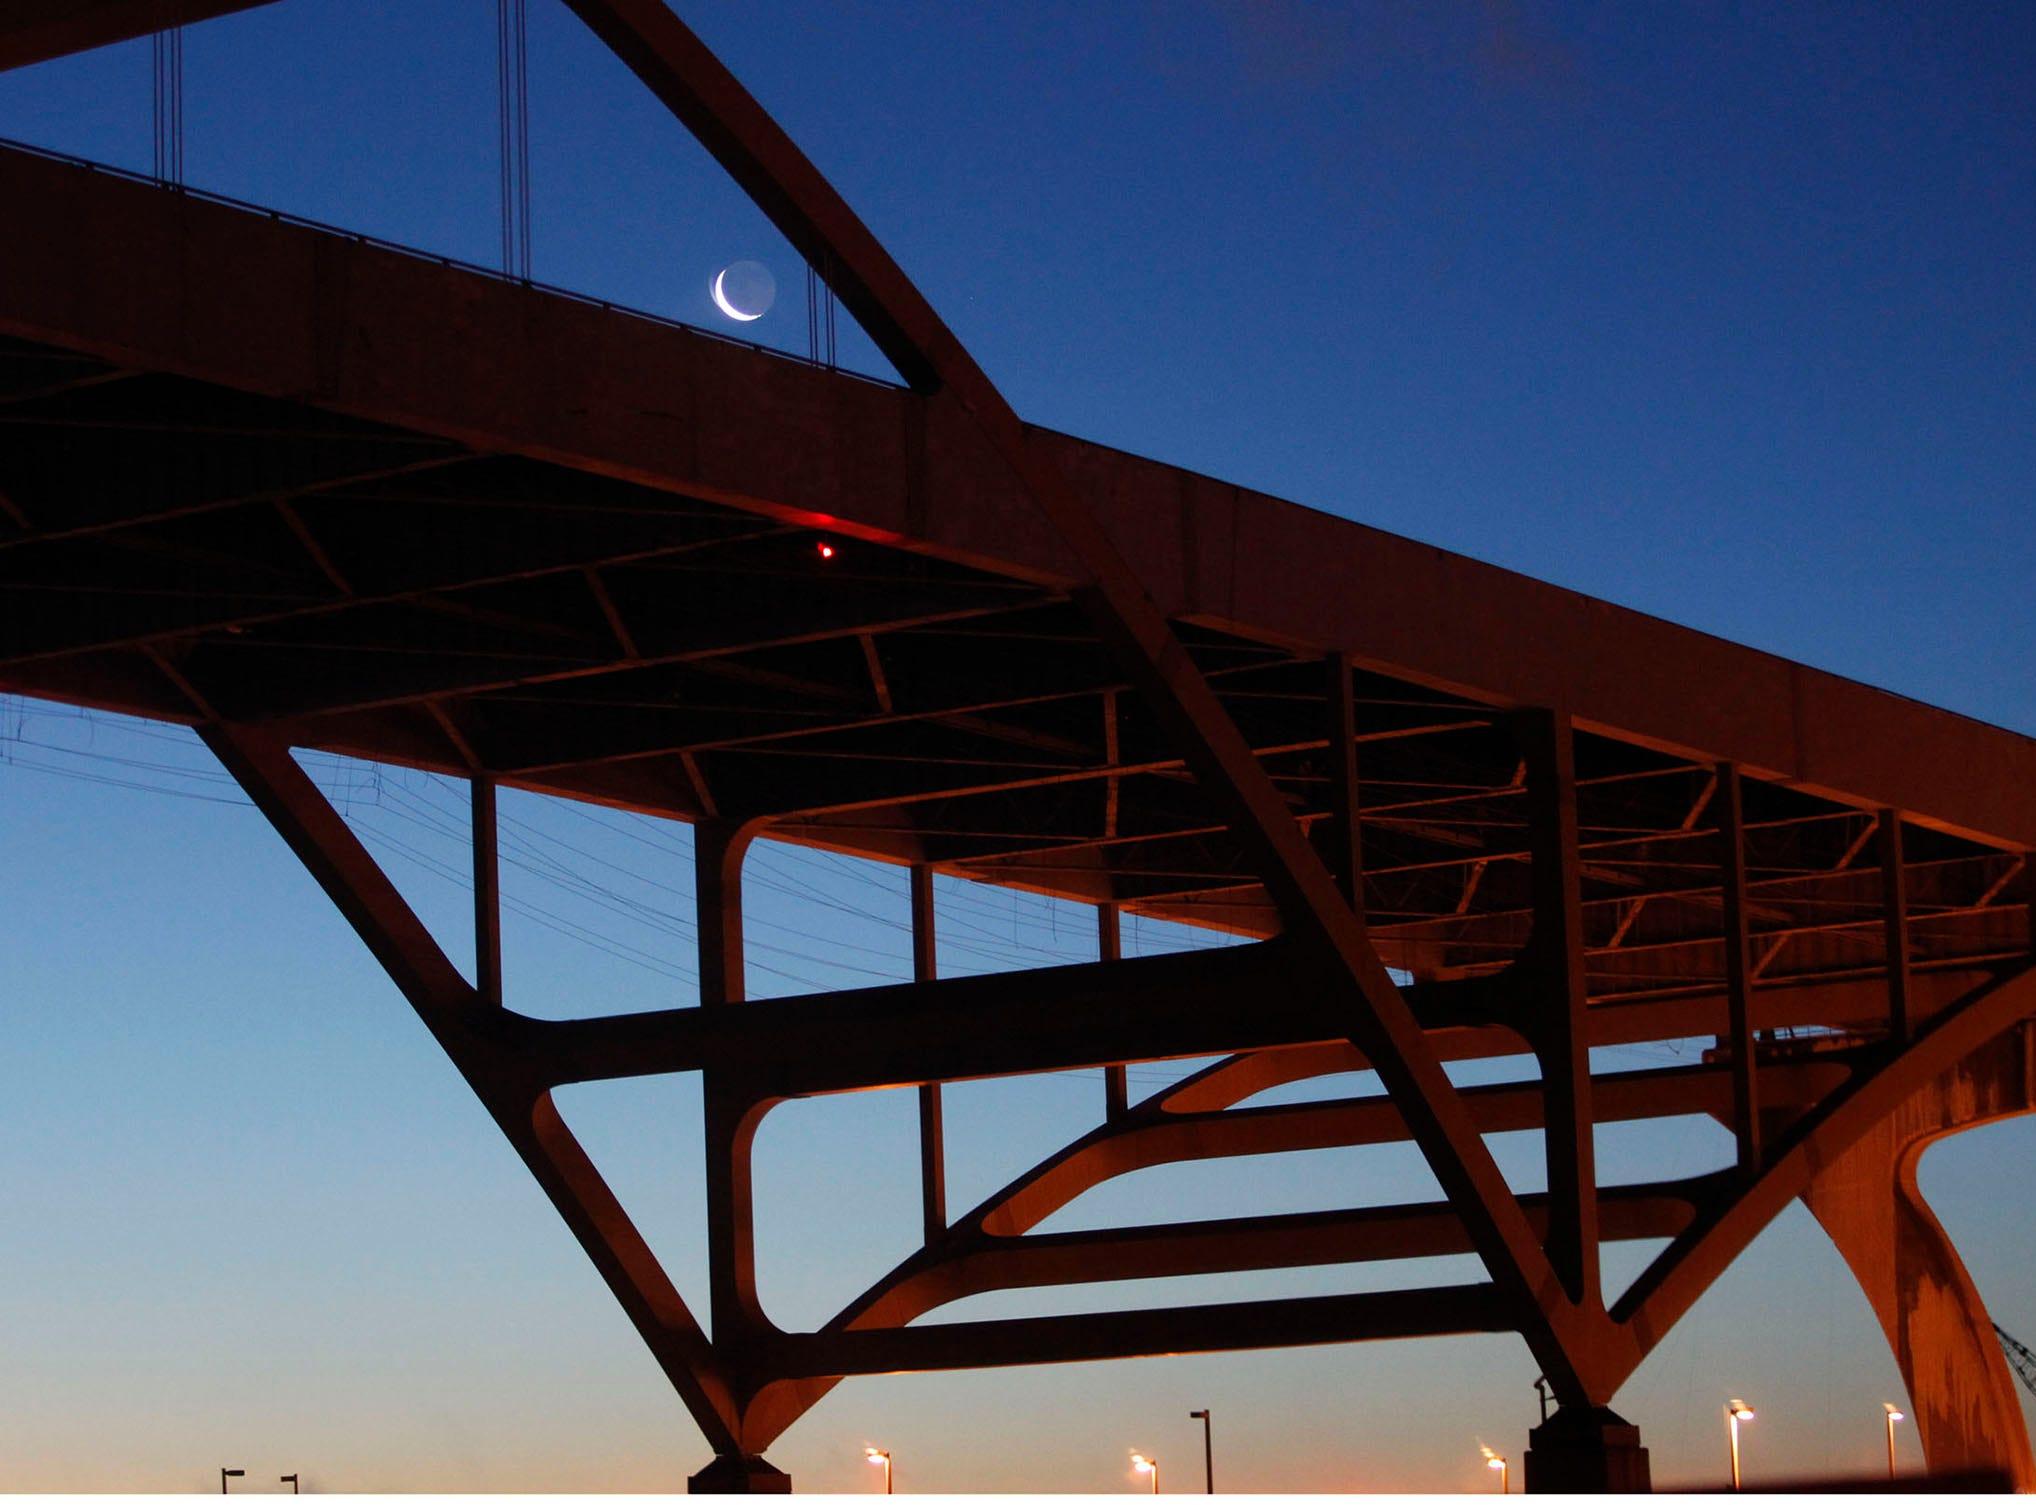 The moon is seen through the Hoan Bridge on Jan. 28, 2014.